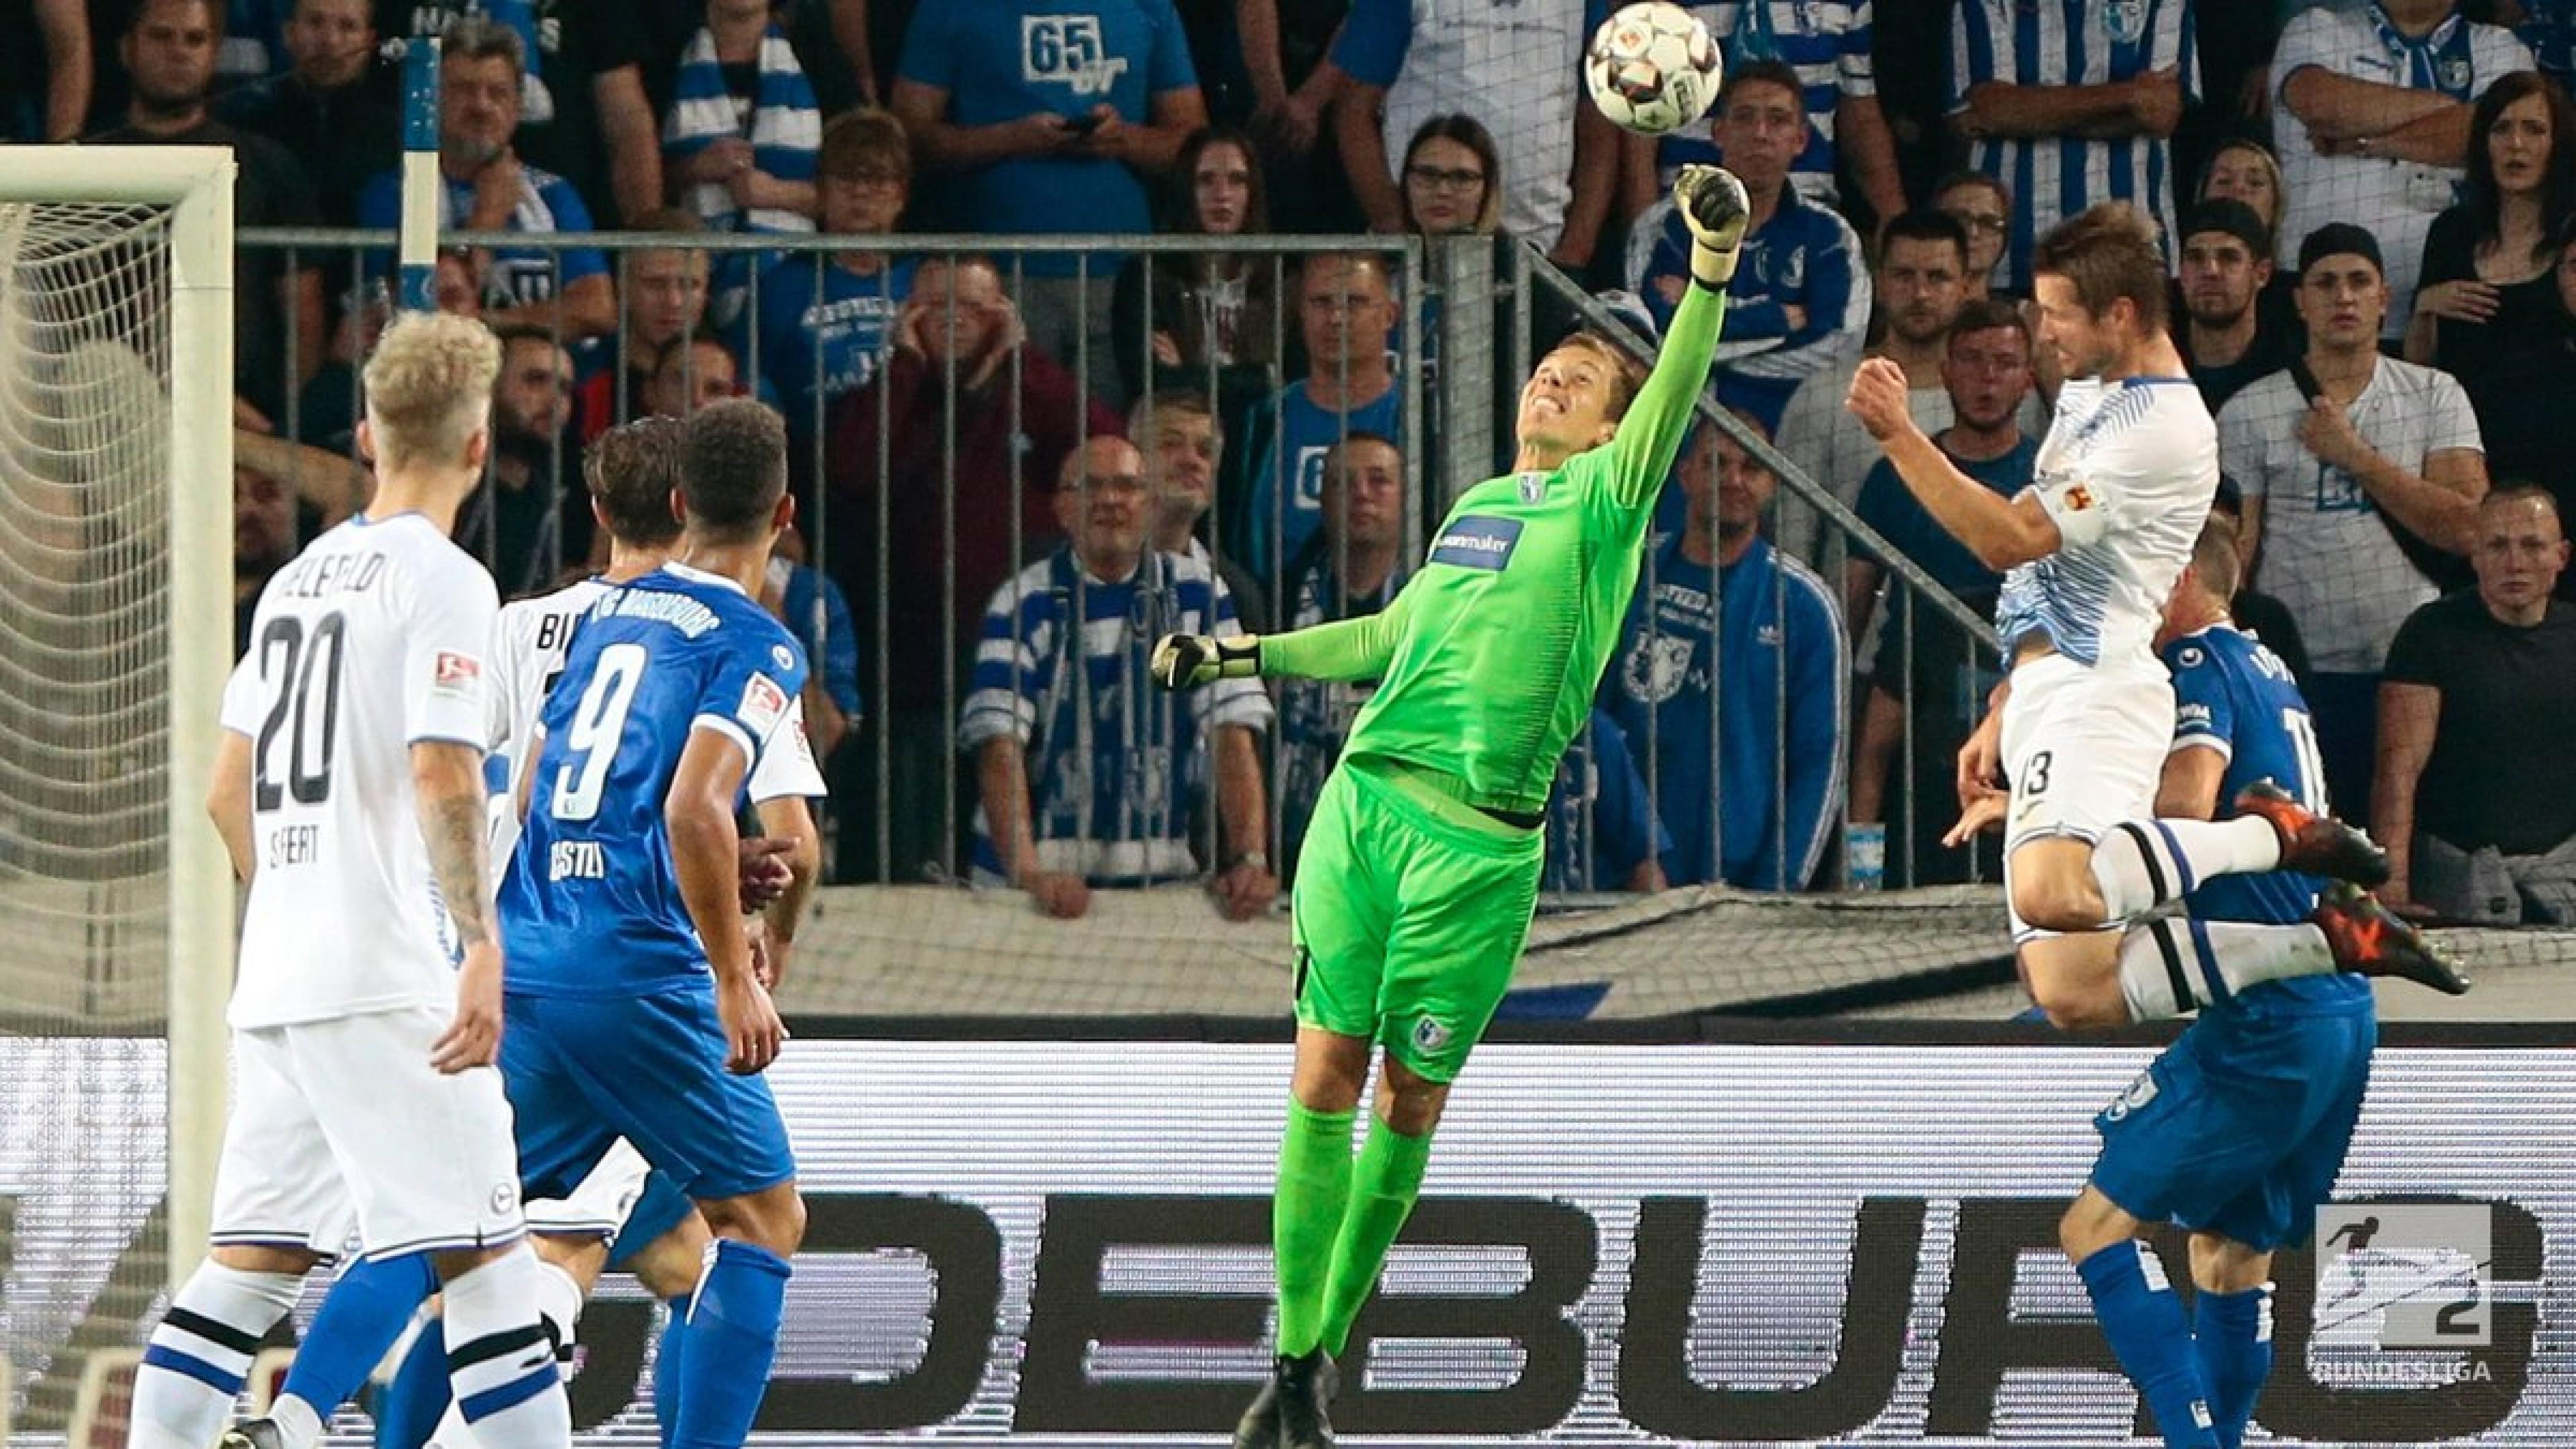 1. FC Magdeburg 0-0 Arminia Bielefeld: Neither side able to break deadlock